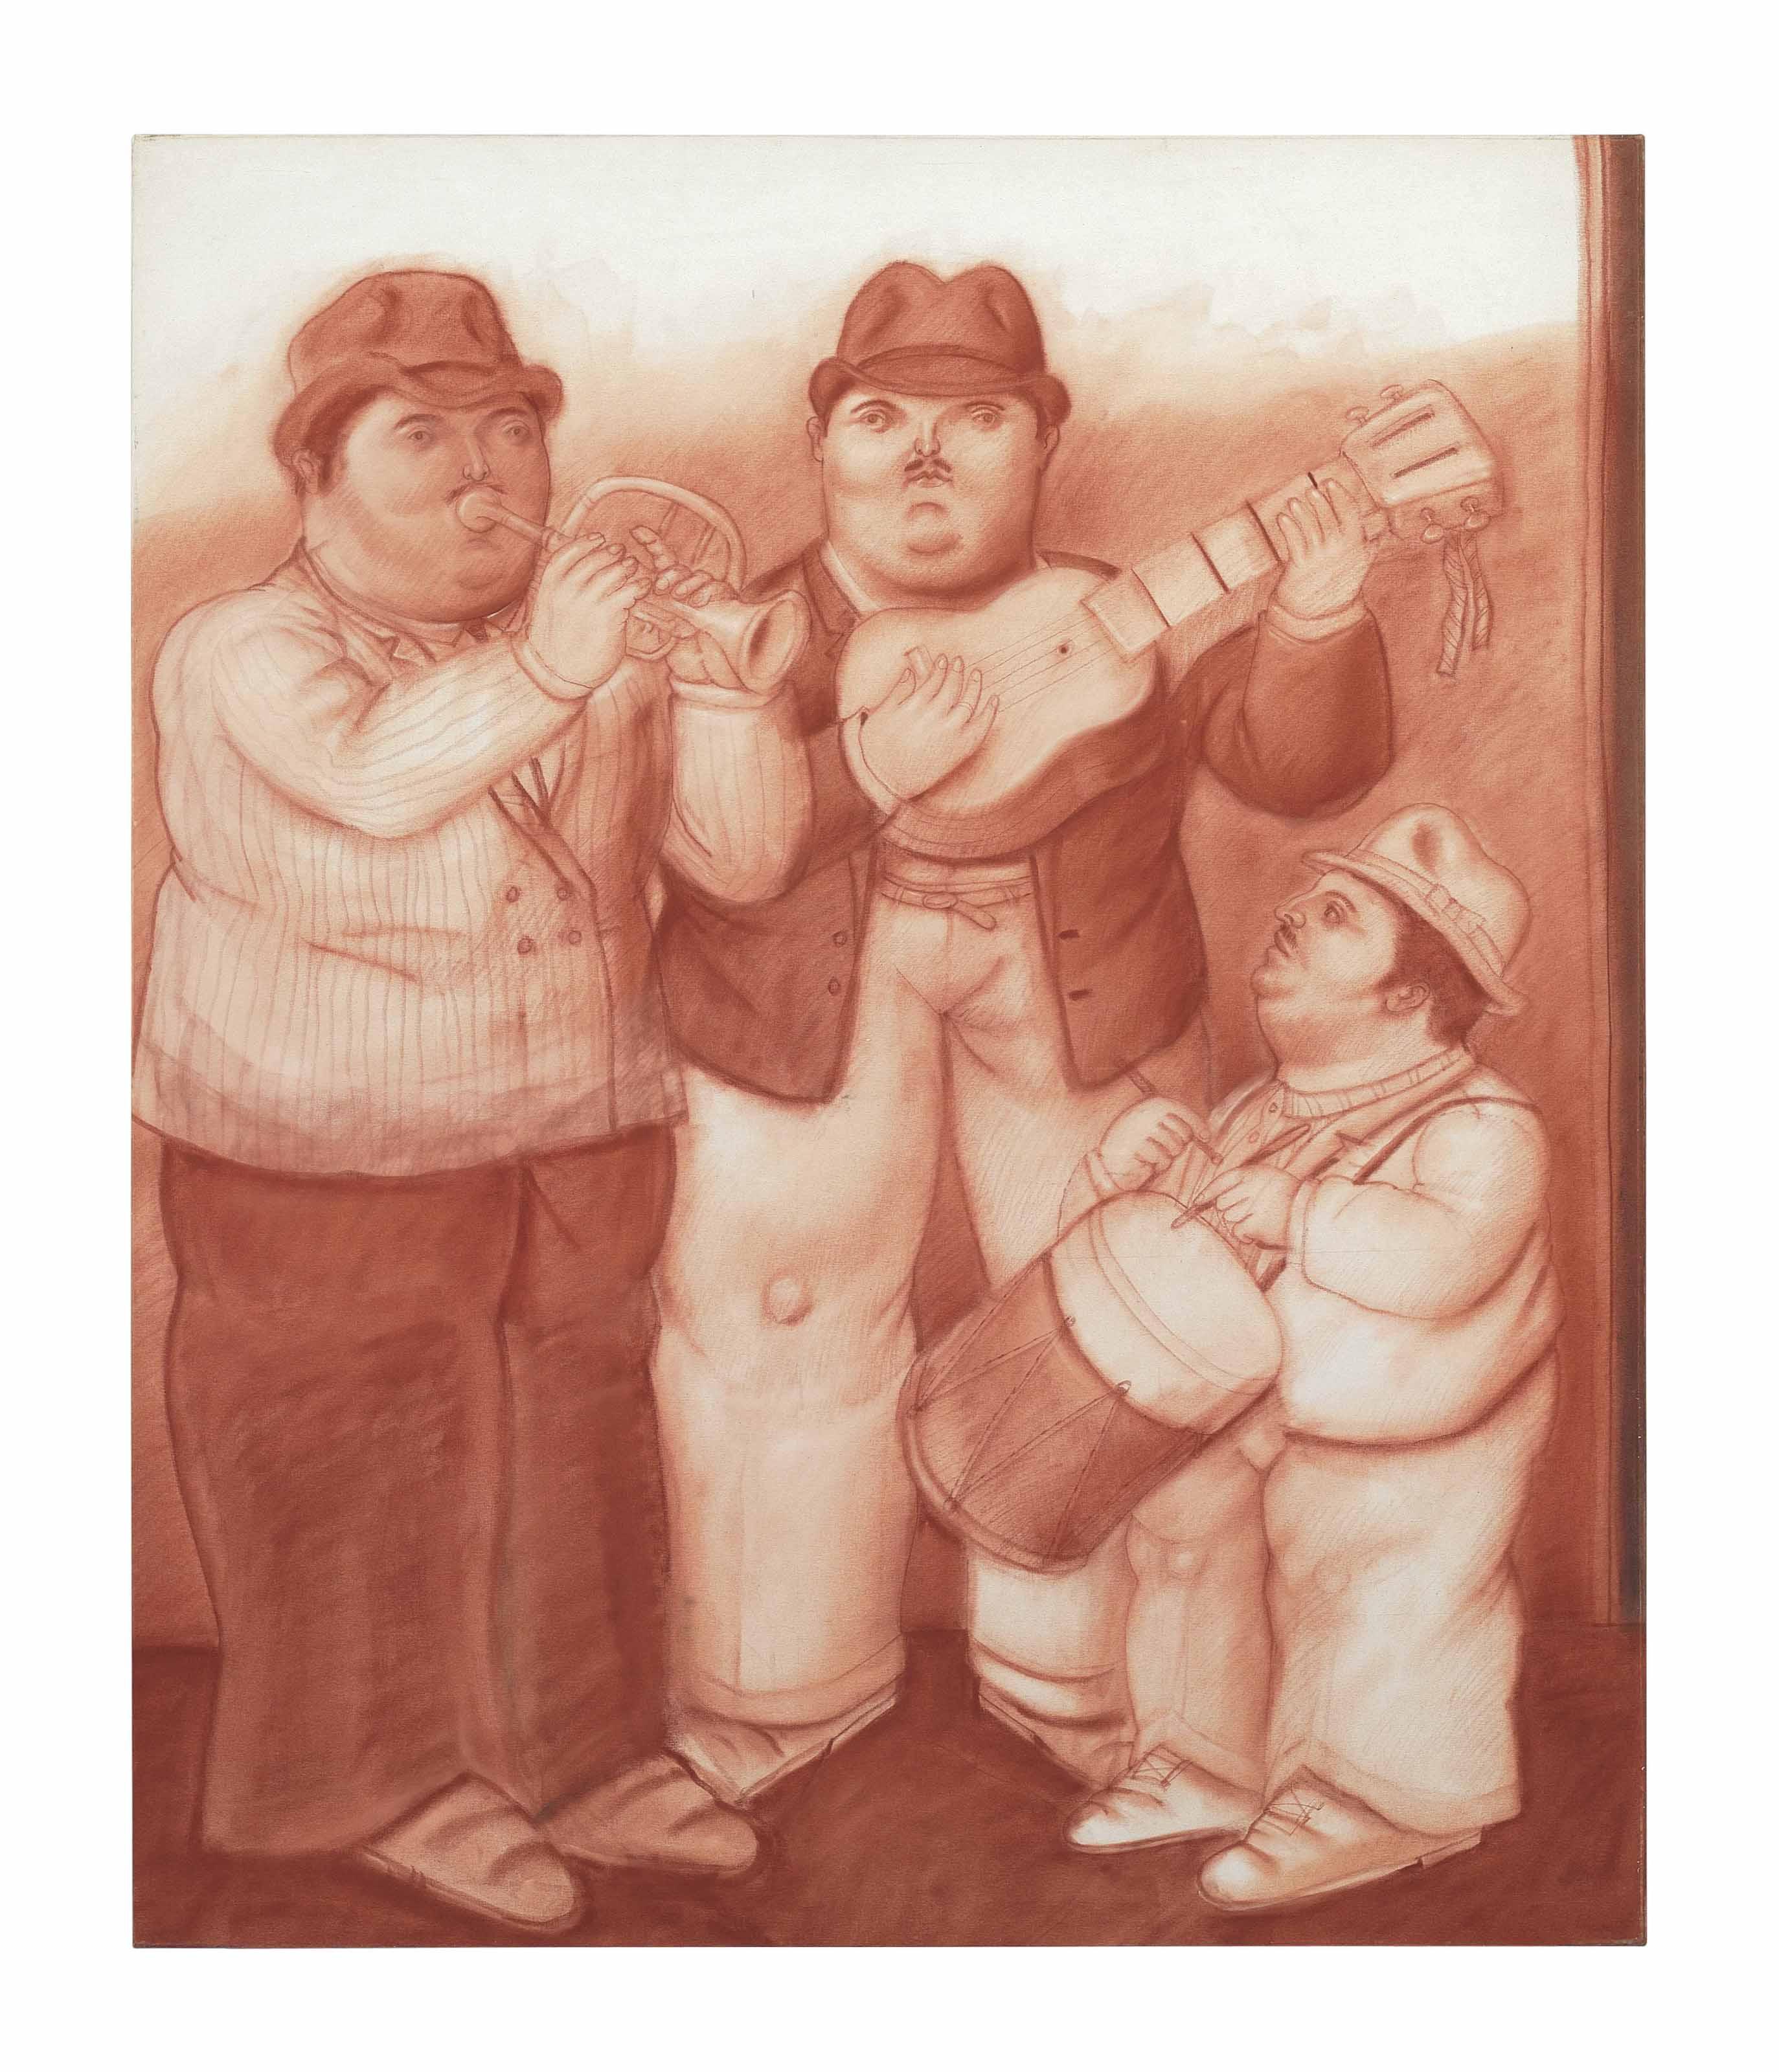 Fernando Botero (b. 1932)